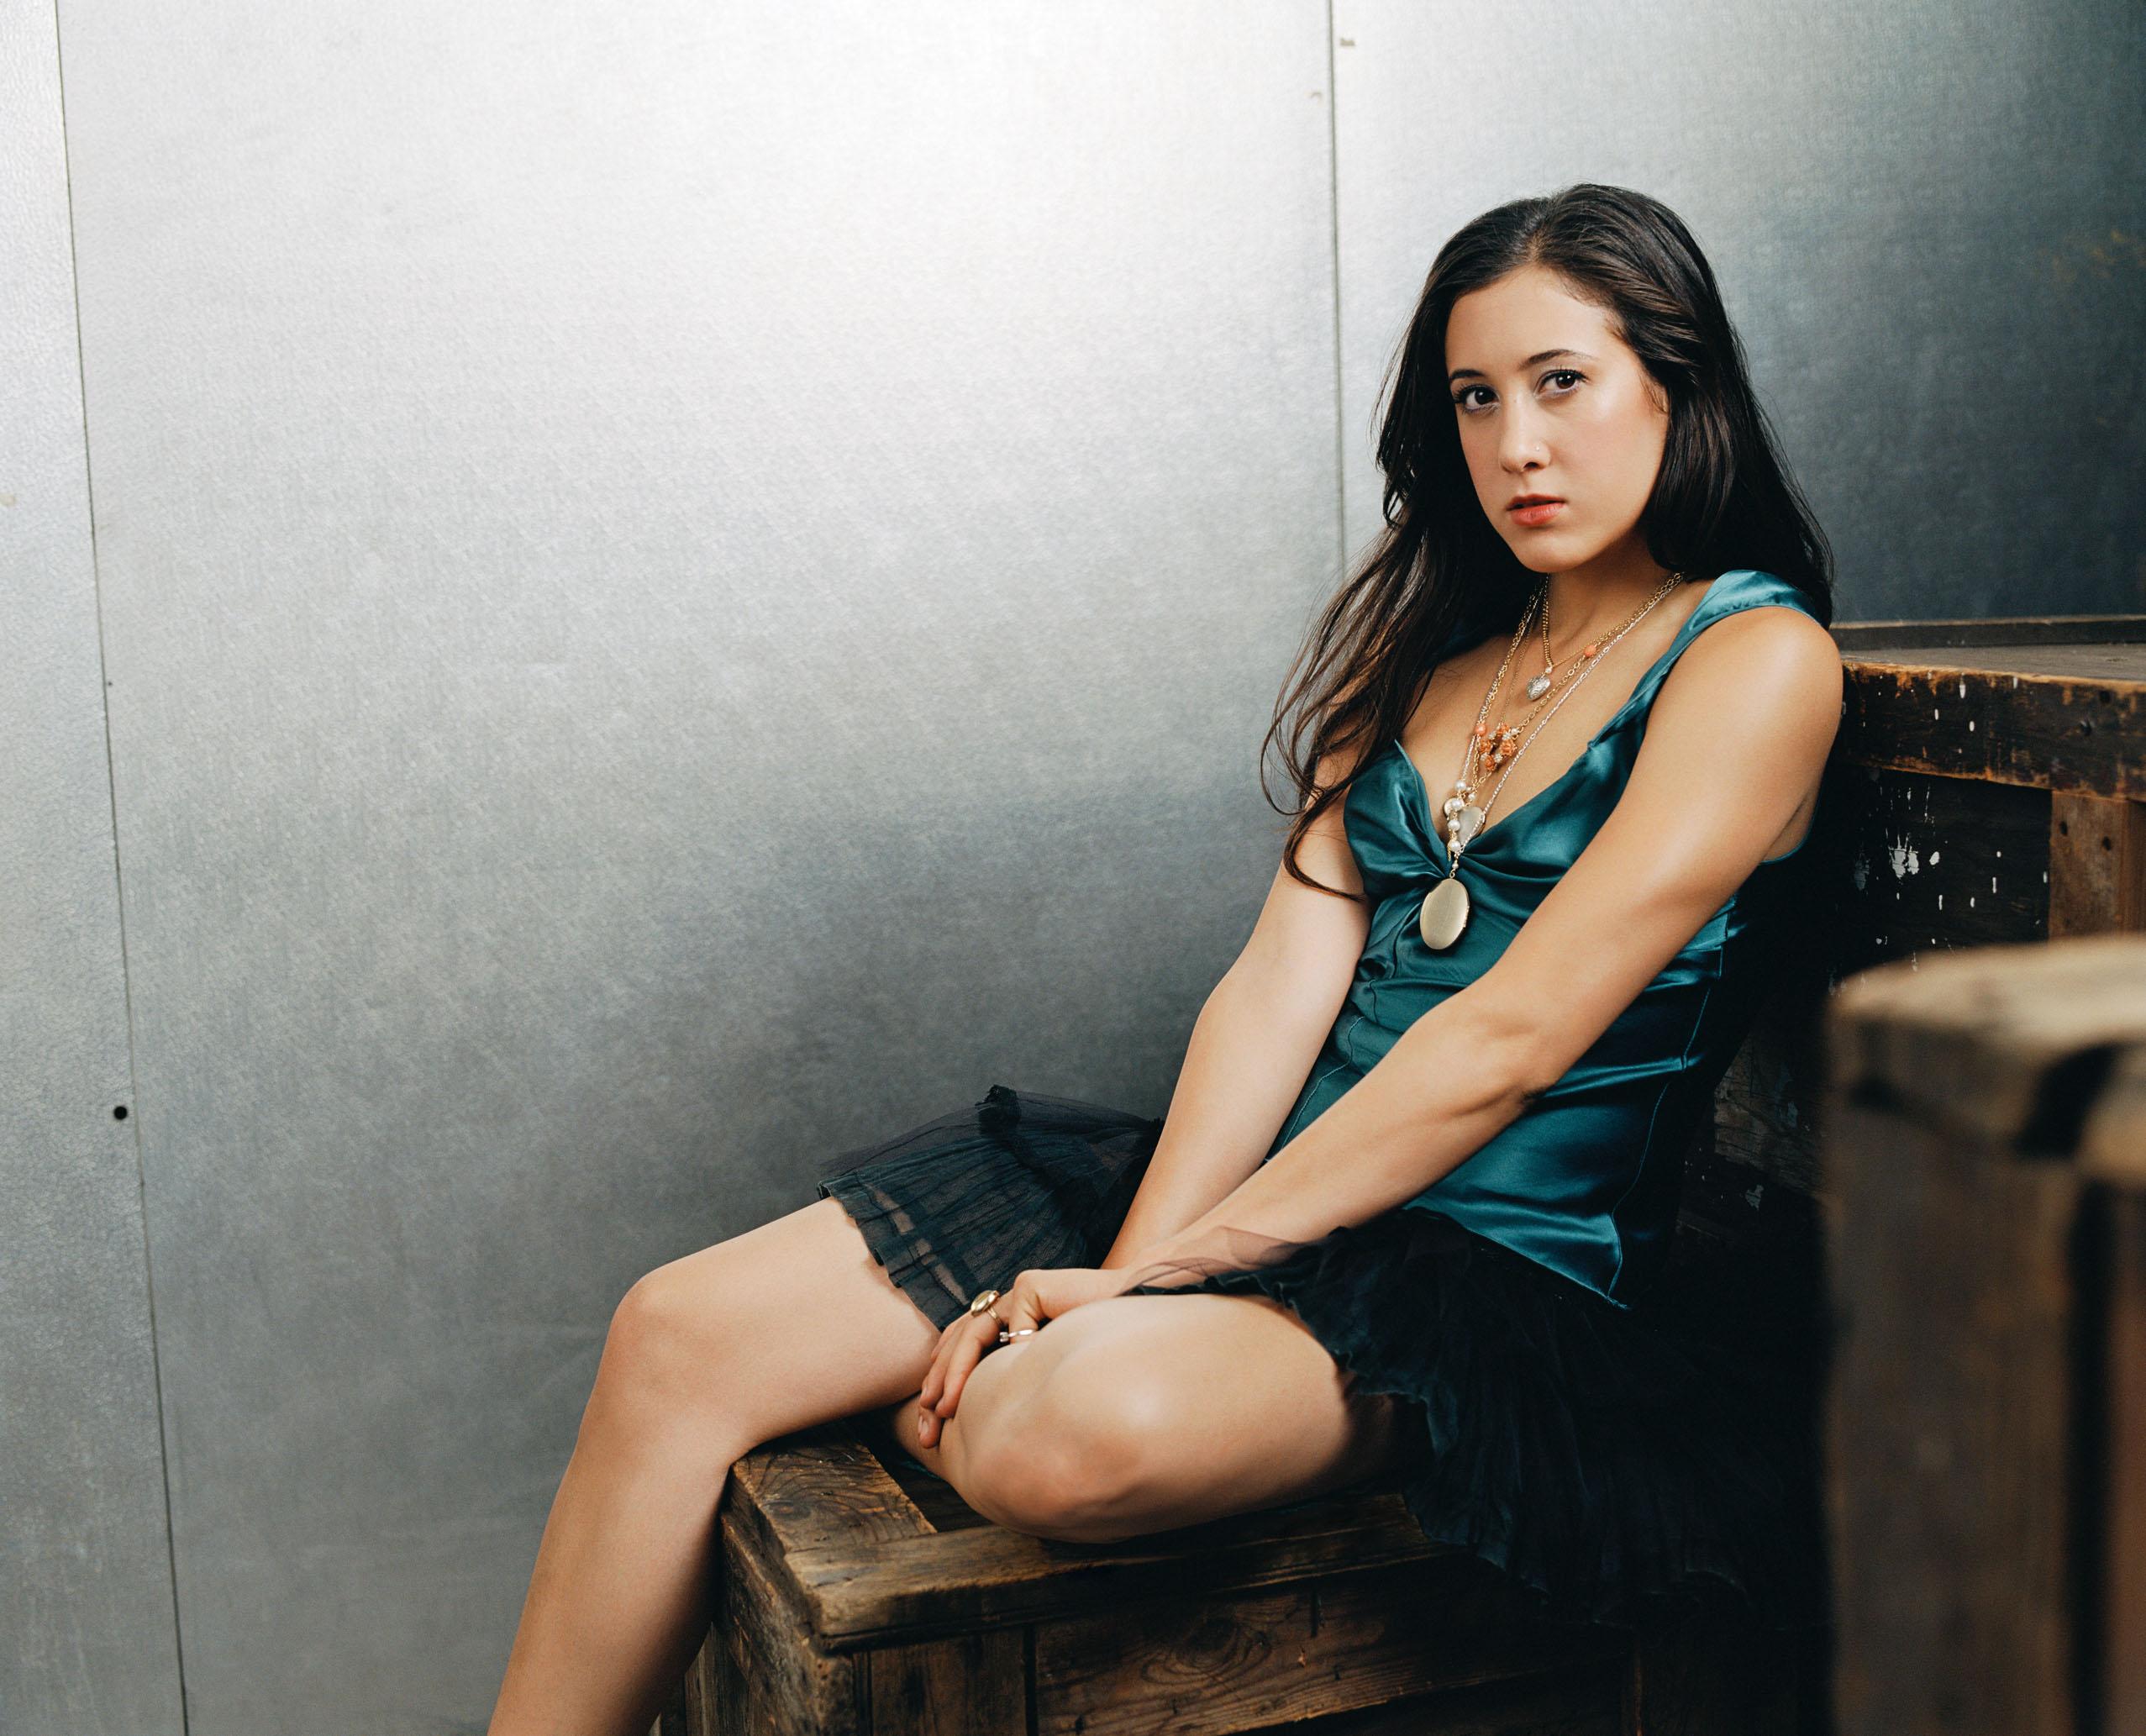 Vanessa Carlton – Be Not Nobody – Least Worst Option: http://www.leastworstoption.com/vanessa-carlton-be-not-nobody/